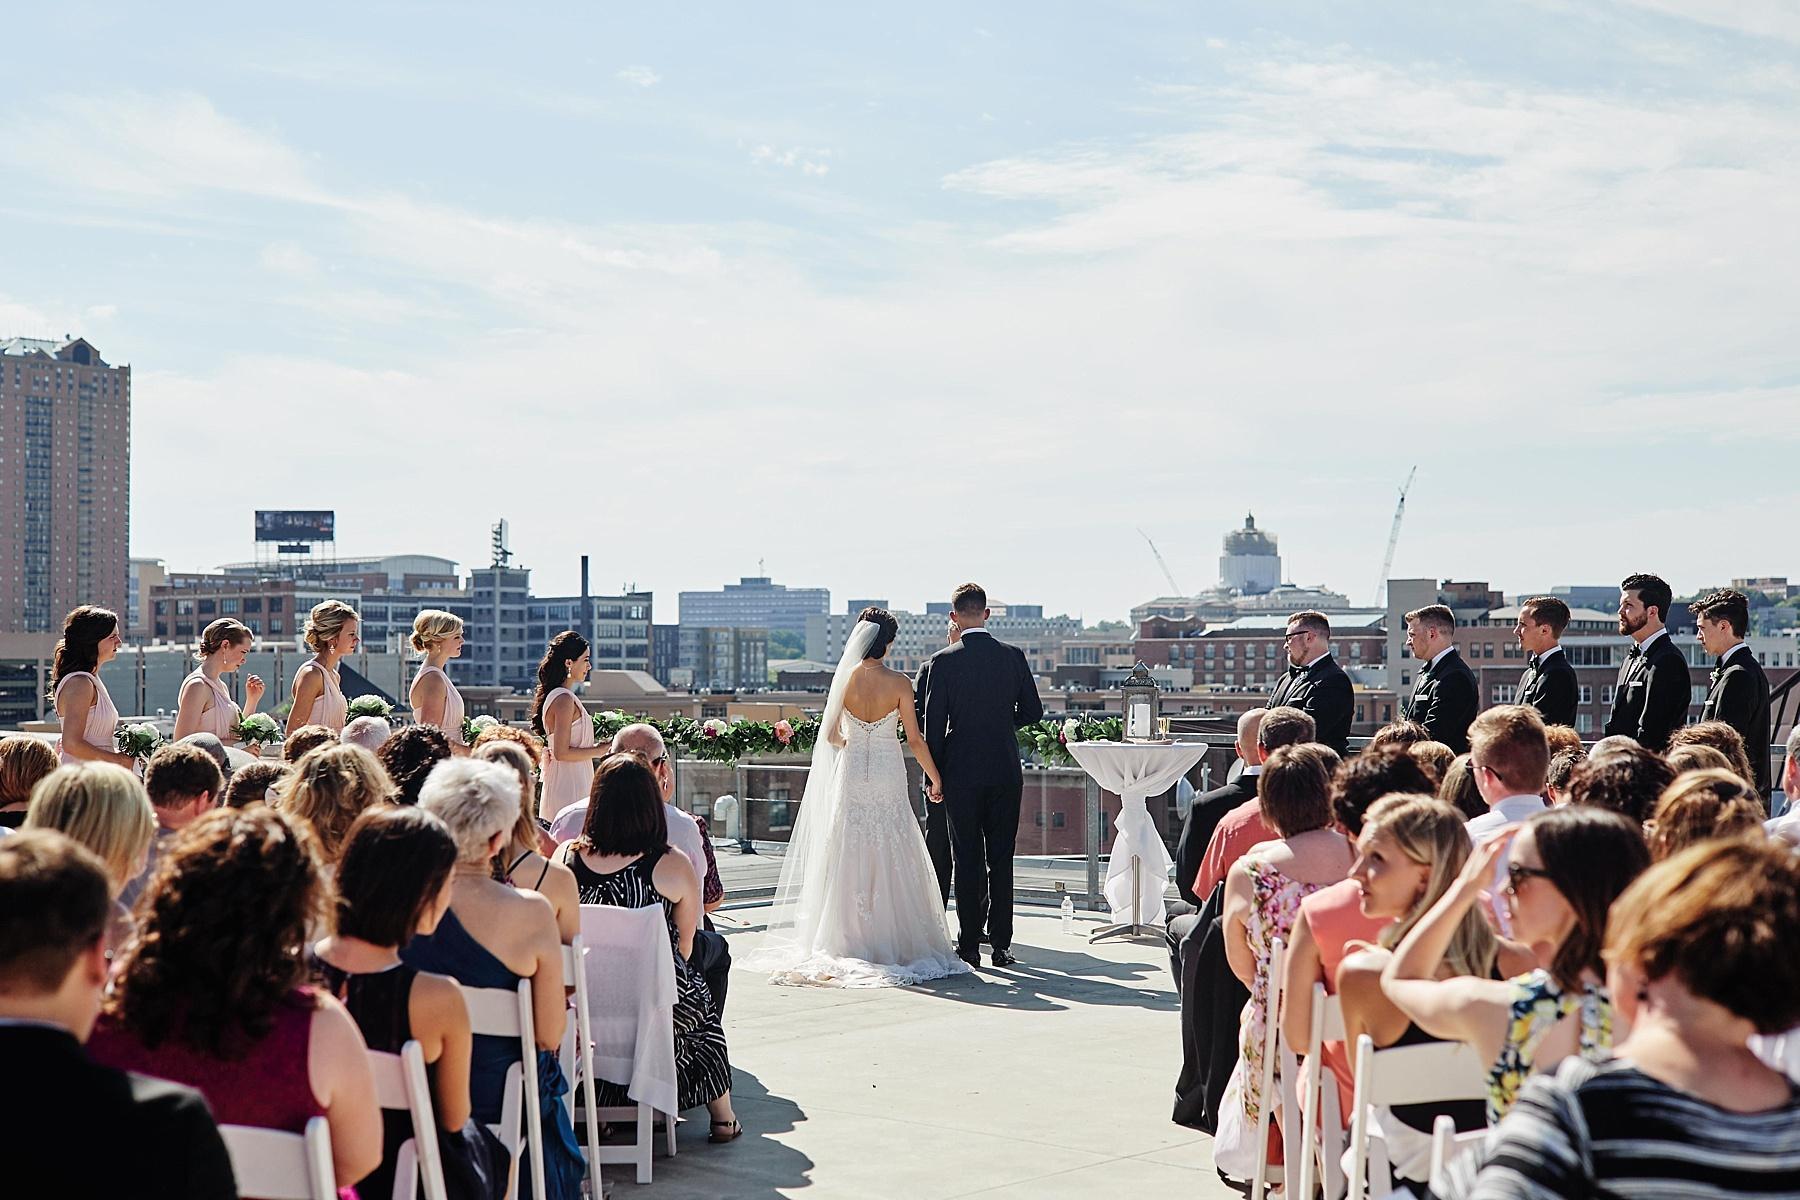 ABULAE-Wedding-Saint-paul-MN-Josh-Sofia-Wedding-Mears-Park_0762.jpg